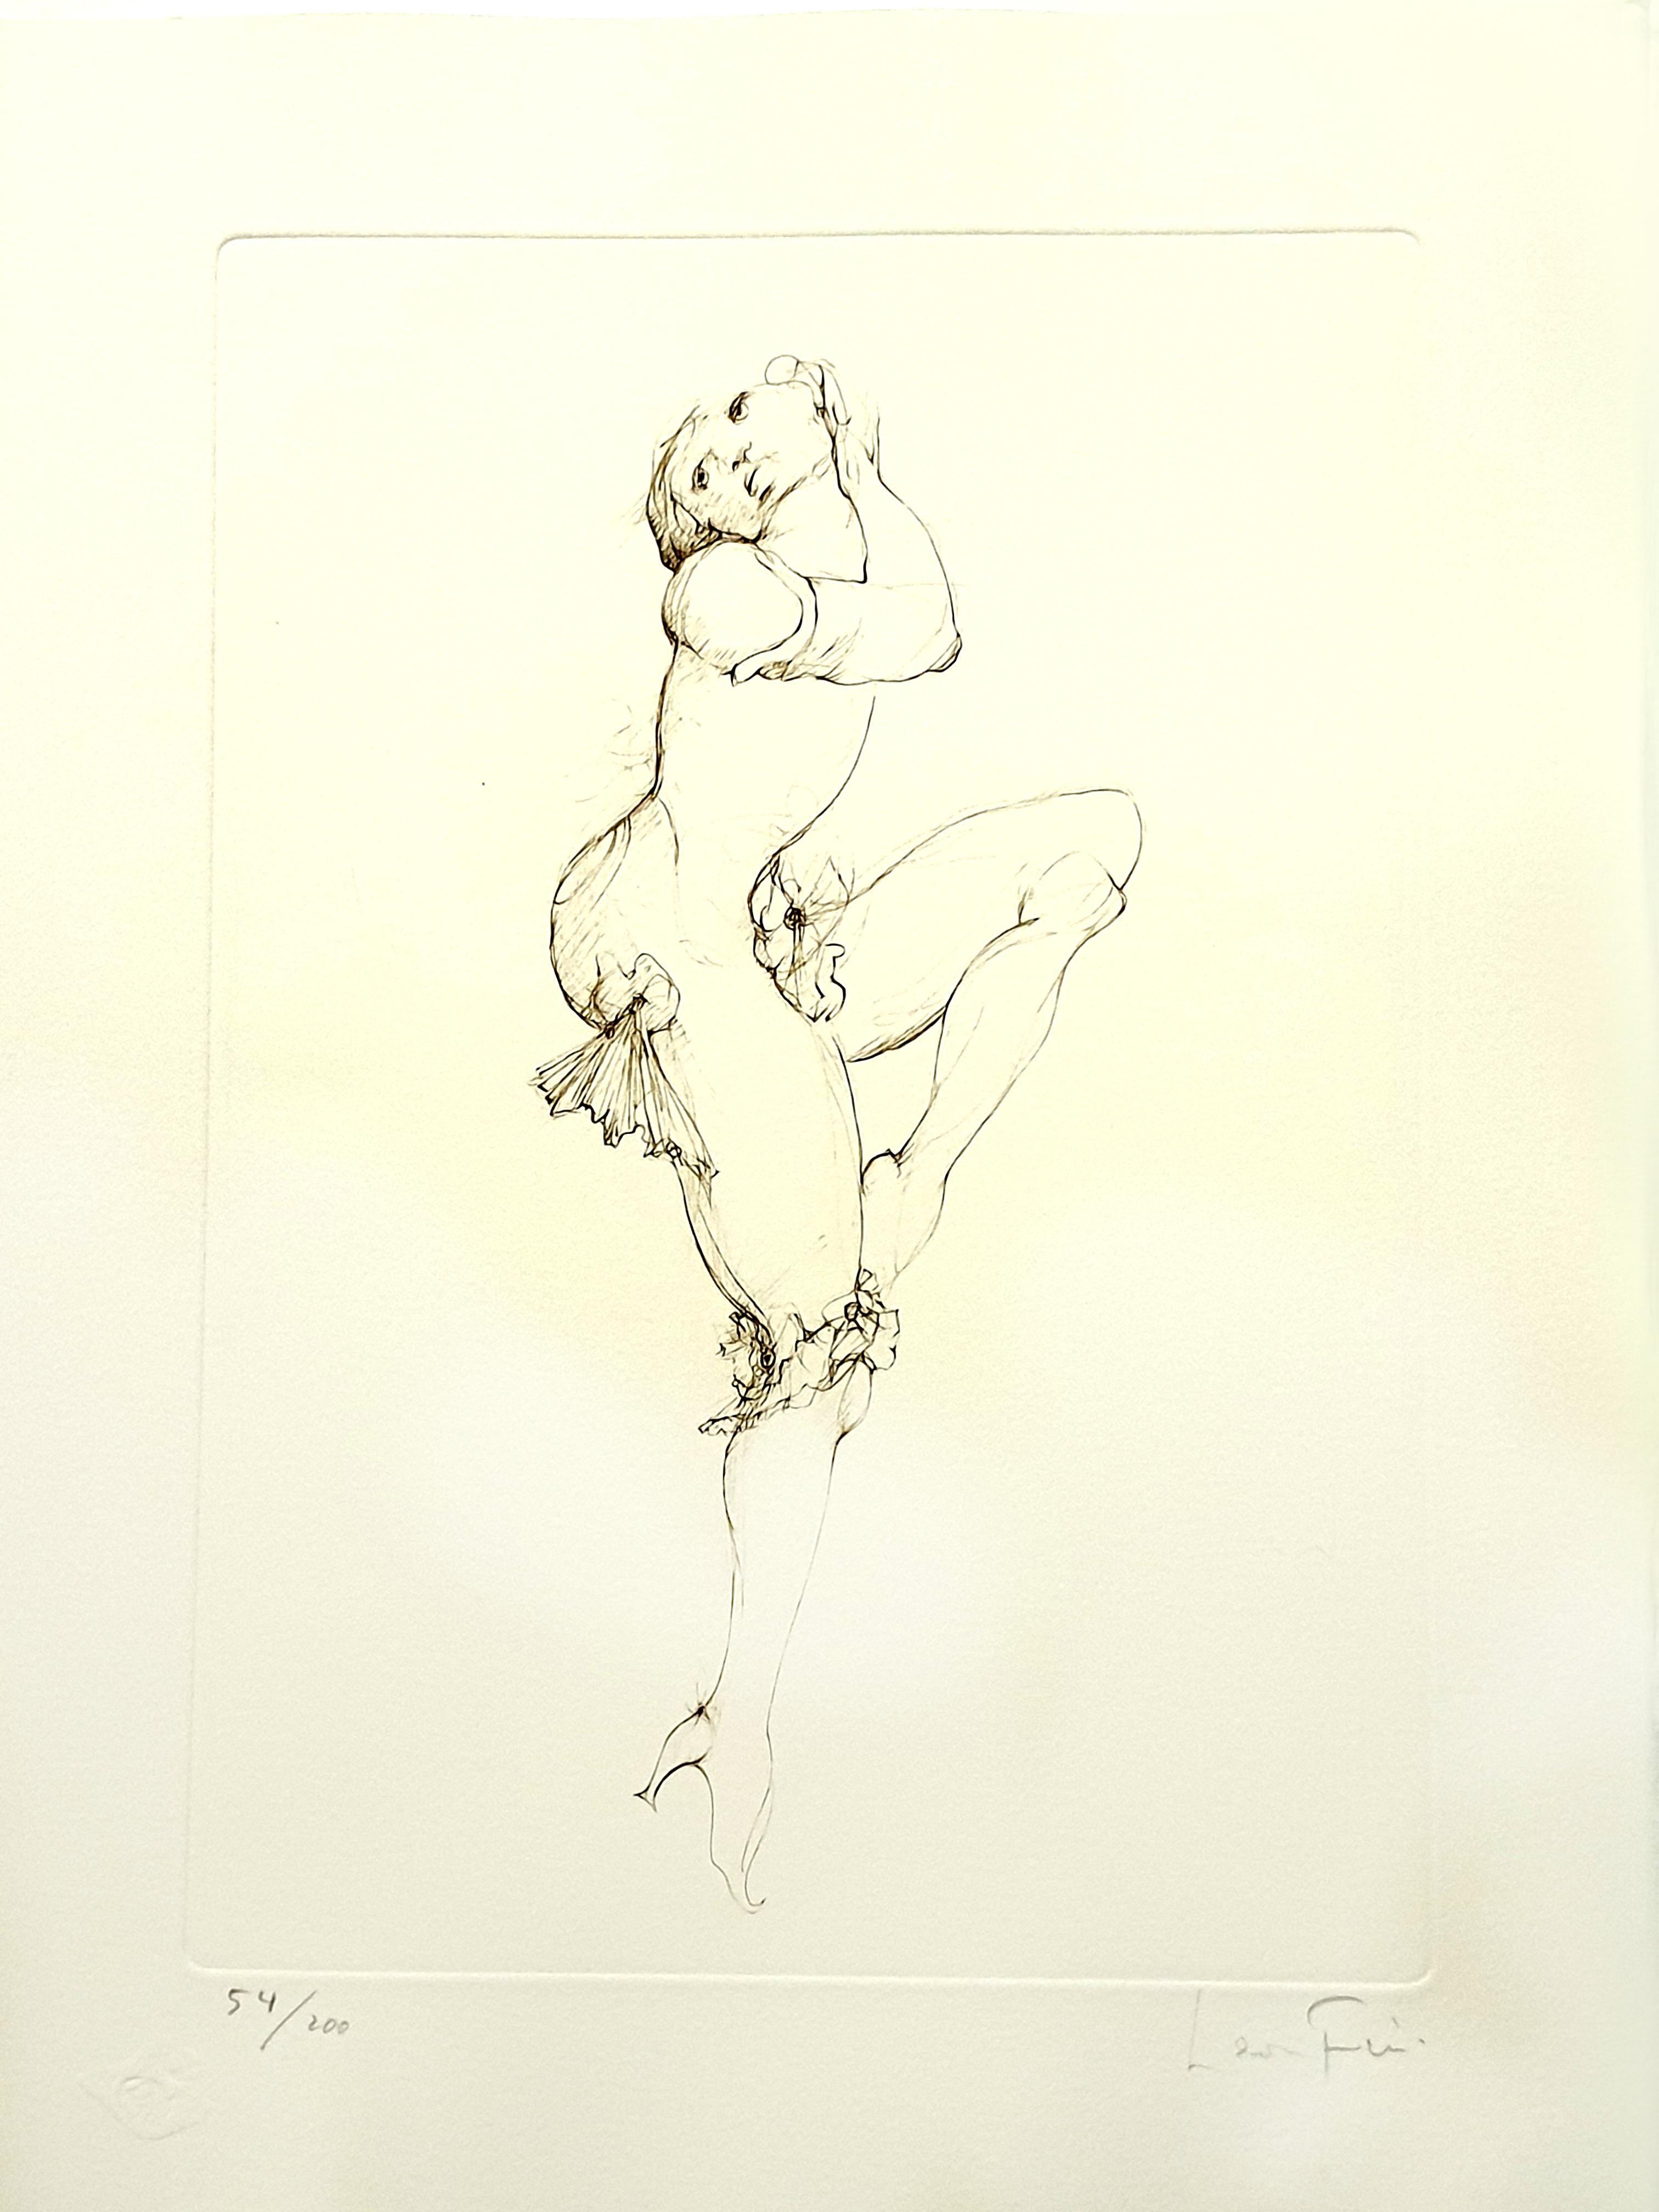 Leonor Fini - Dancing - Original Handsigned Lithograph